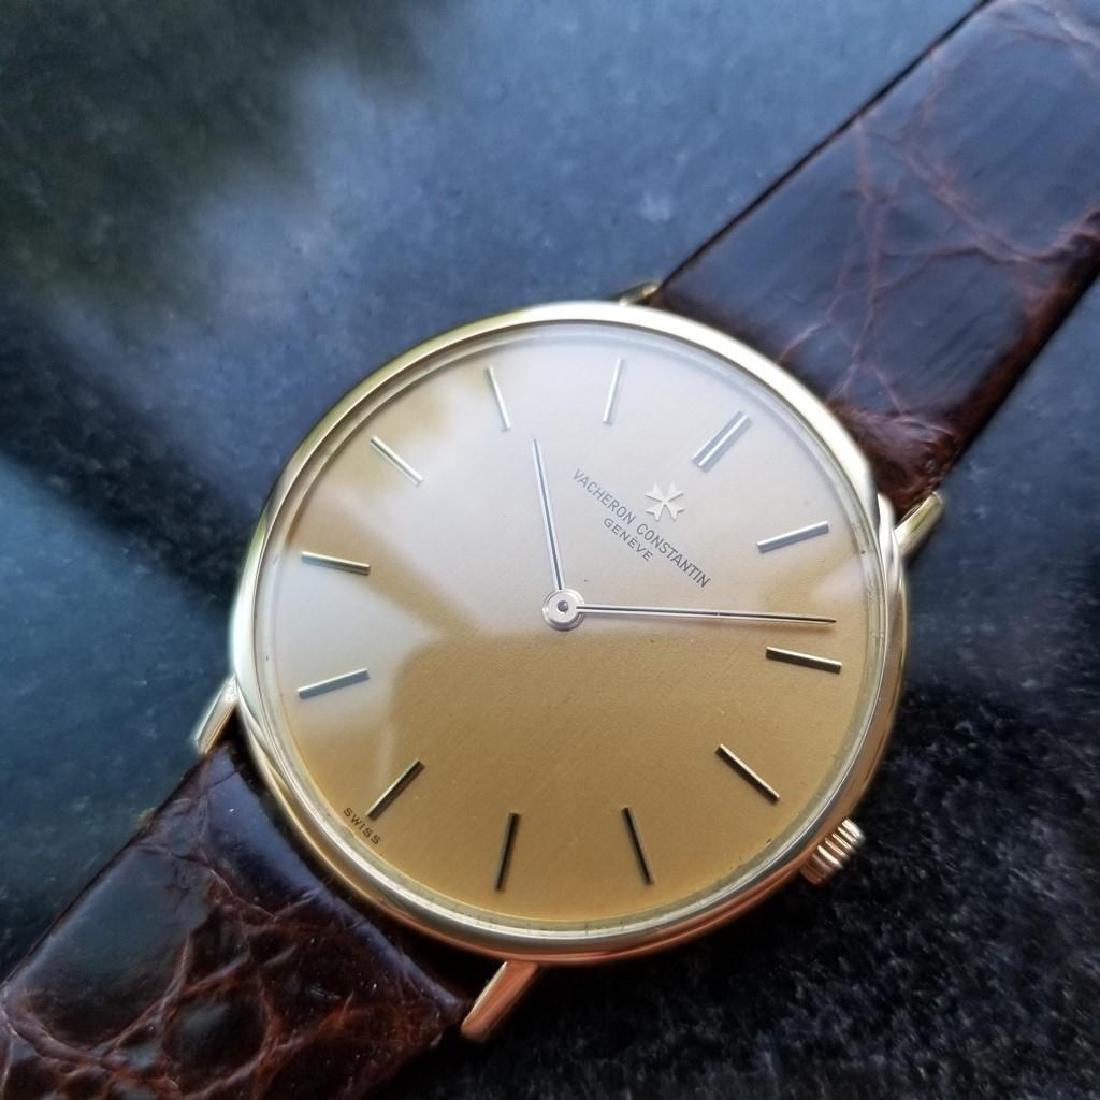 VACHERON CONSTANTIN Men's 18K Gold Geneve Dress Watch